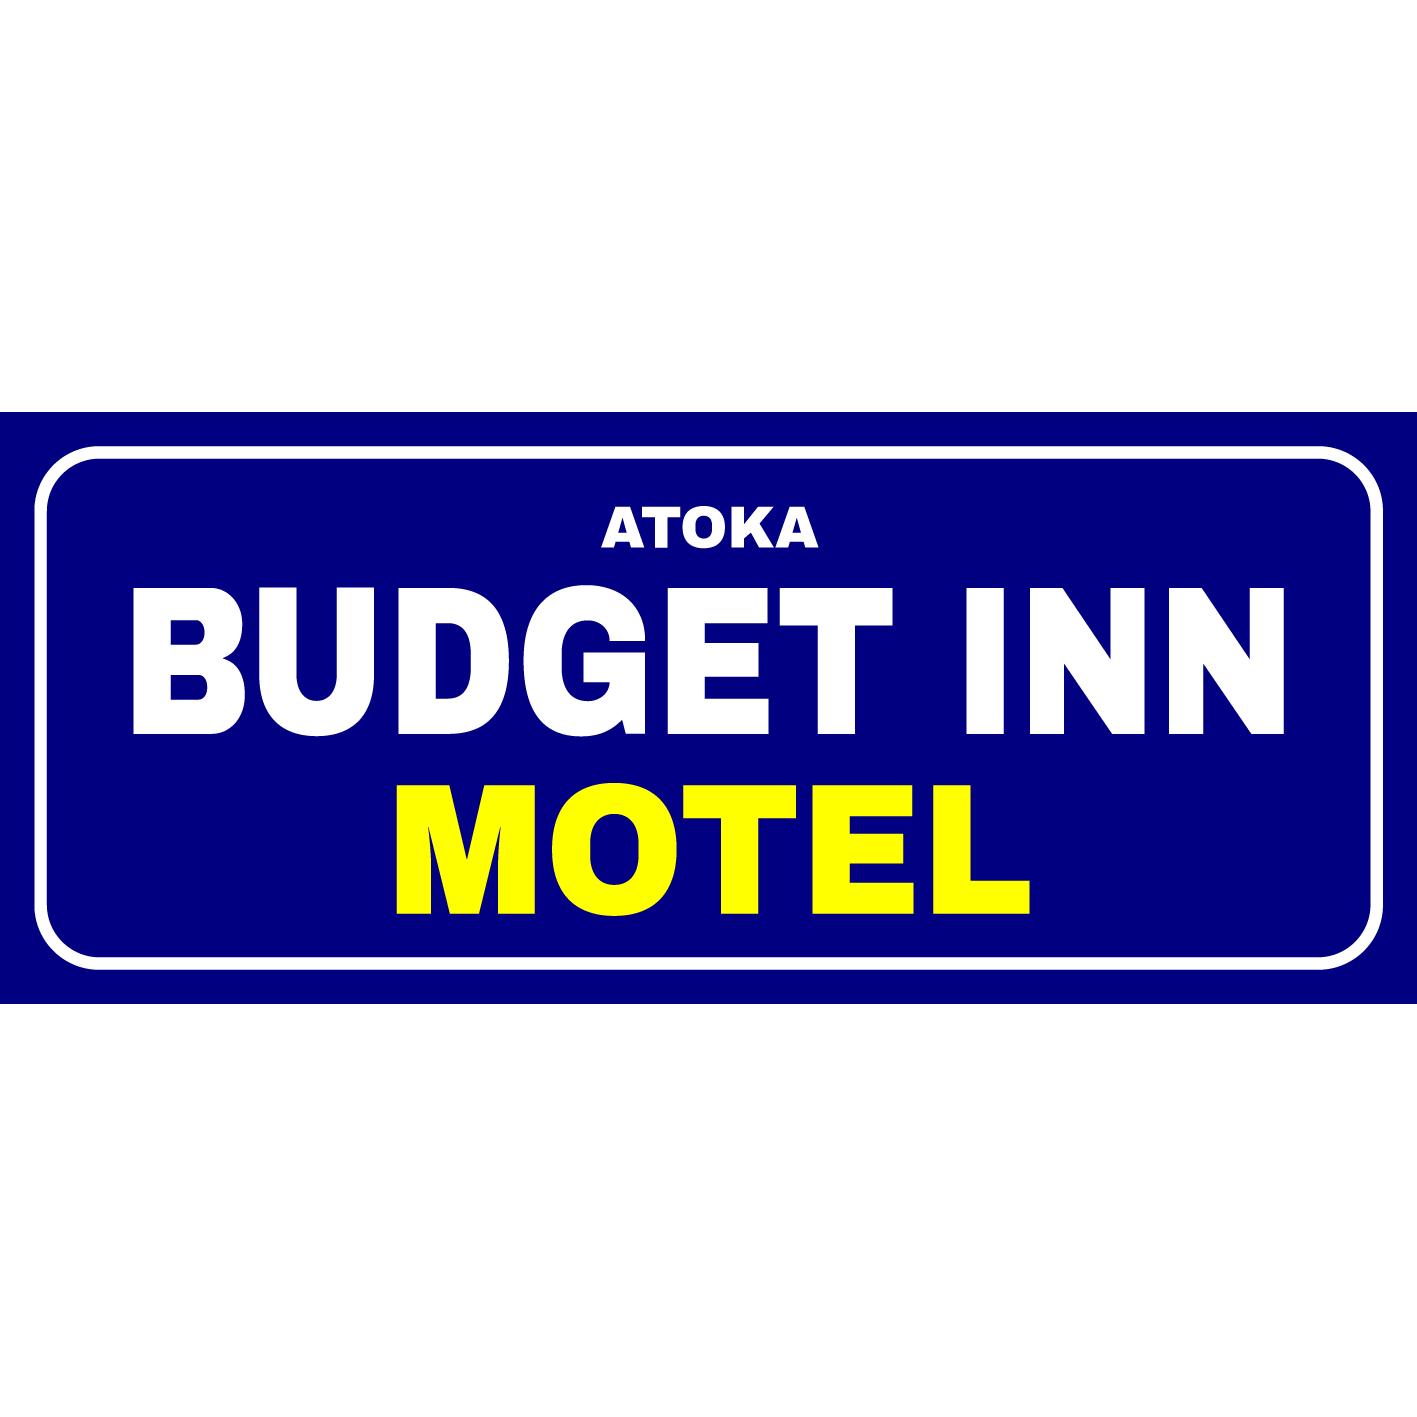 Budget Inn Motel Atoka